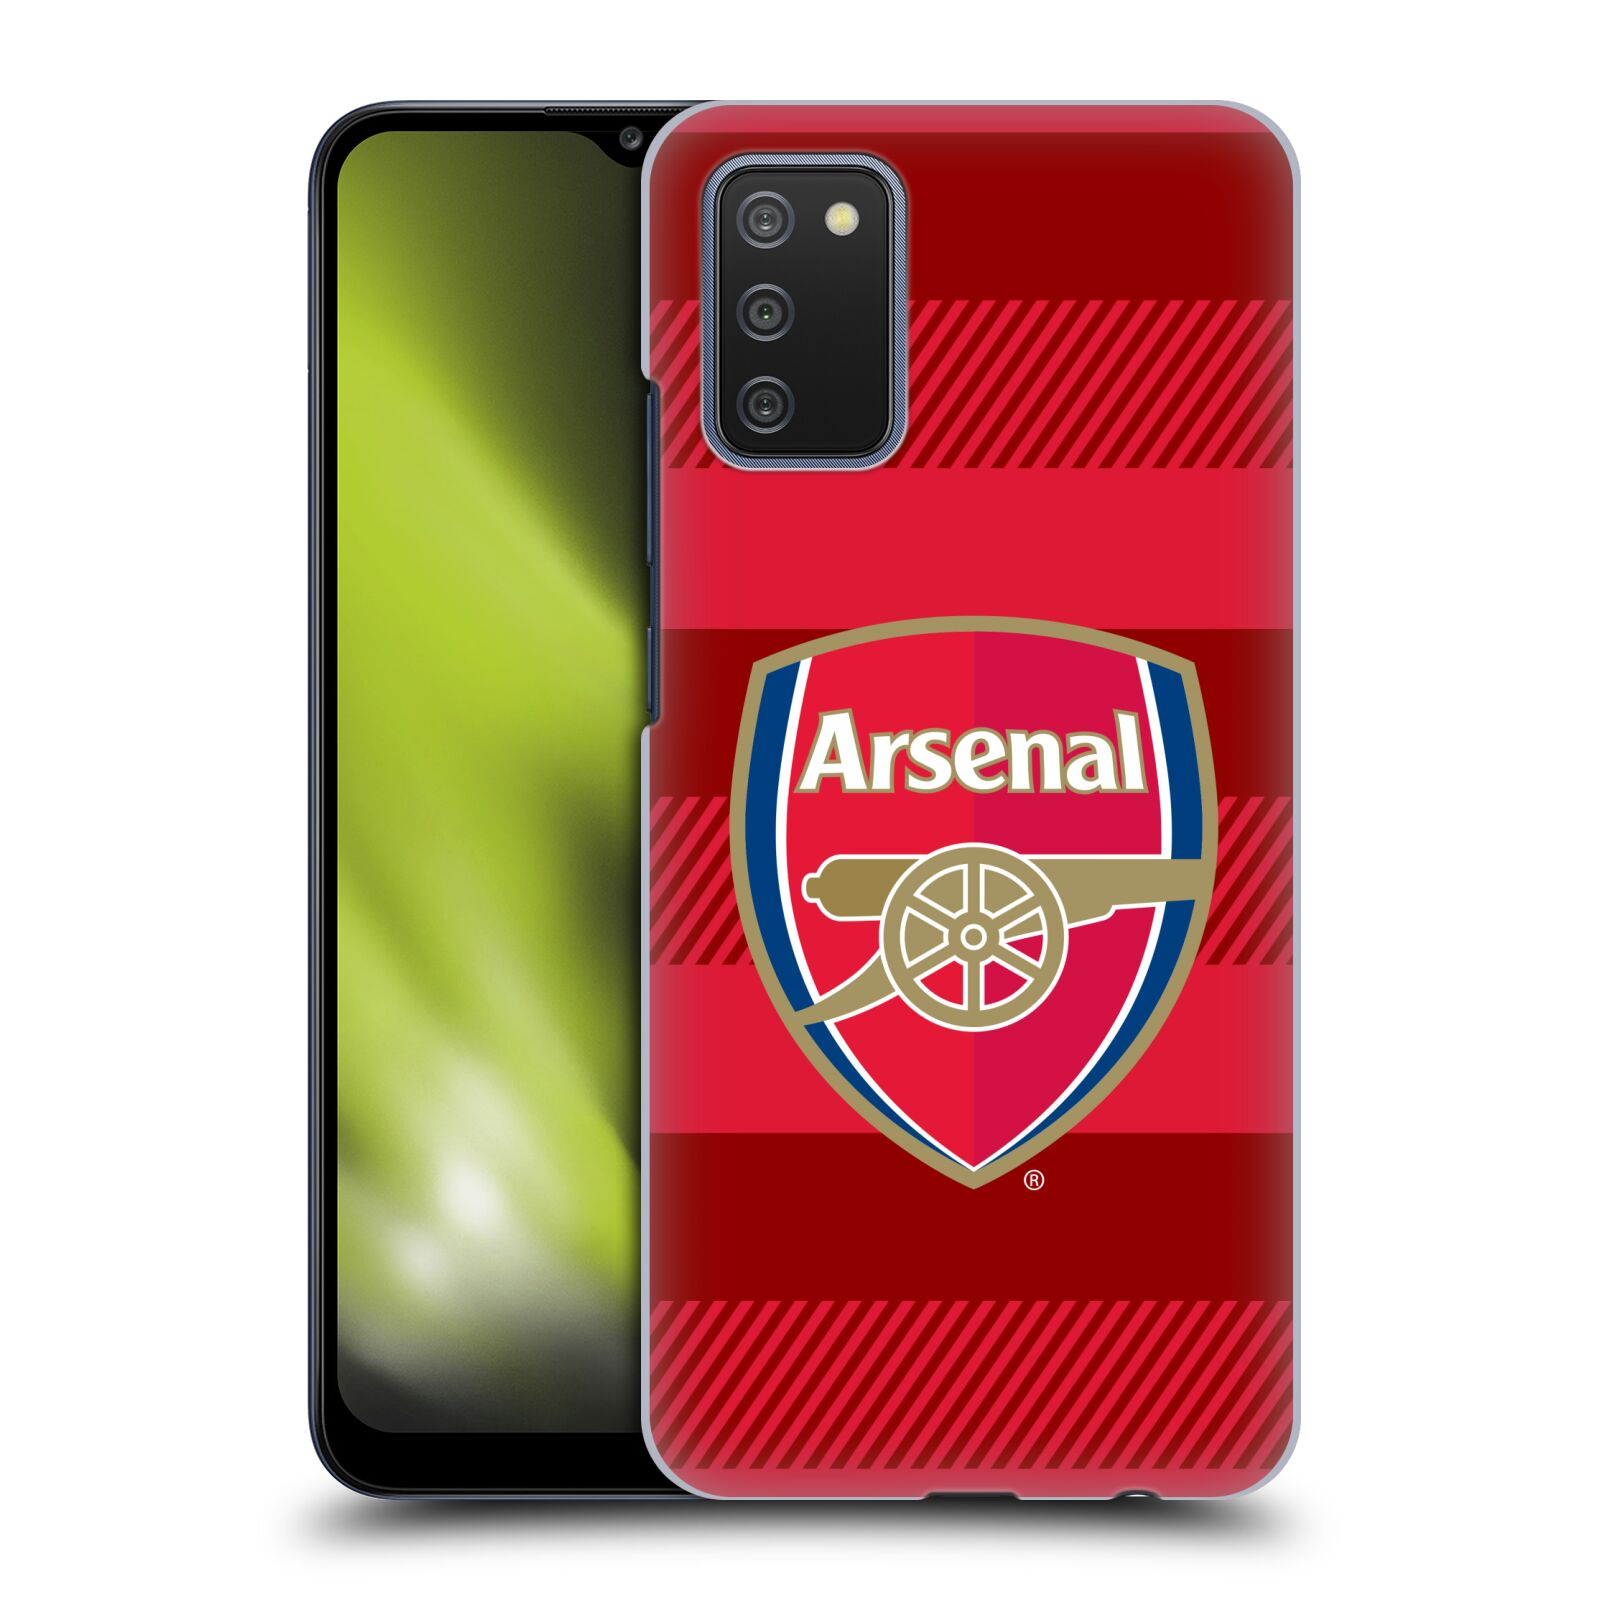 Plastové pouzdro na mobil Samsung Galaxy A02s - Head Case - Arsenal FC - Logo s pruhy